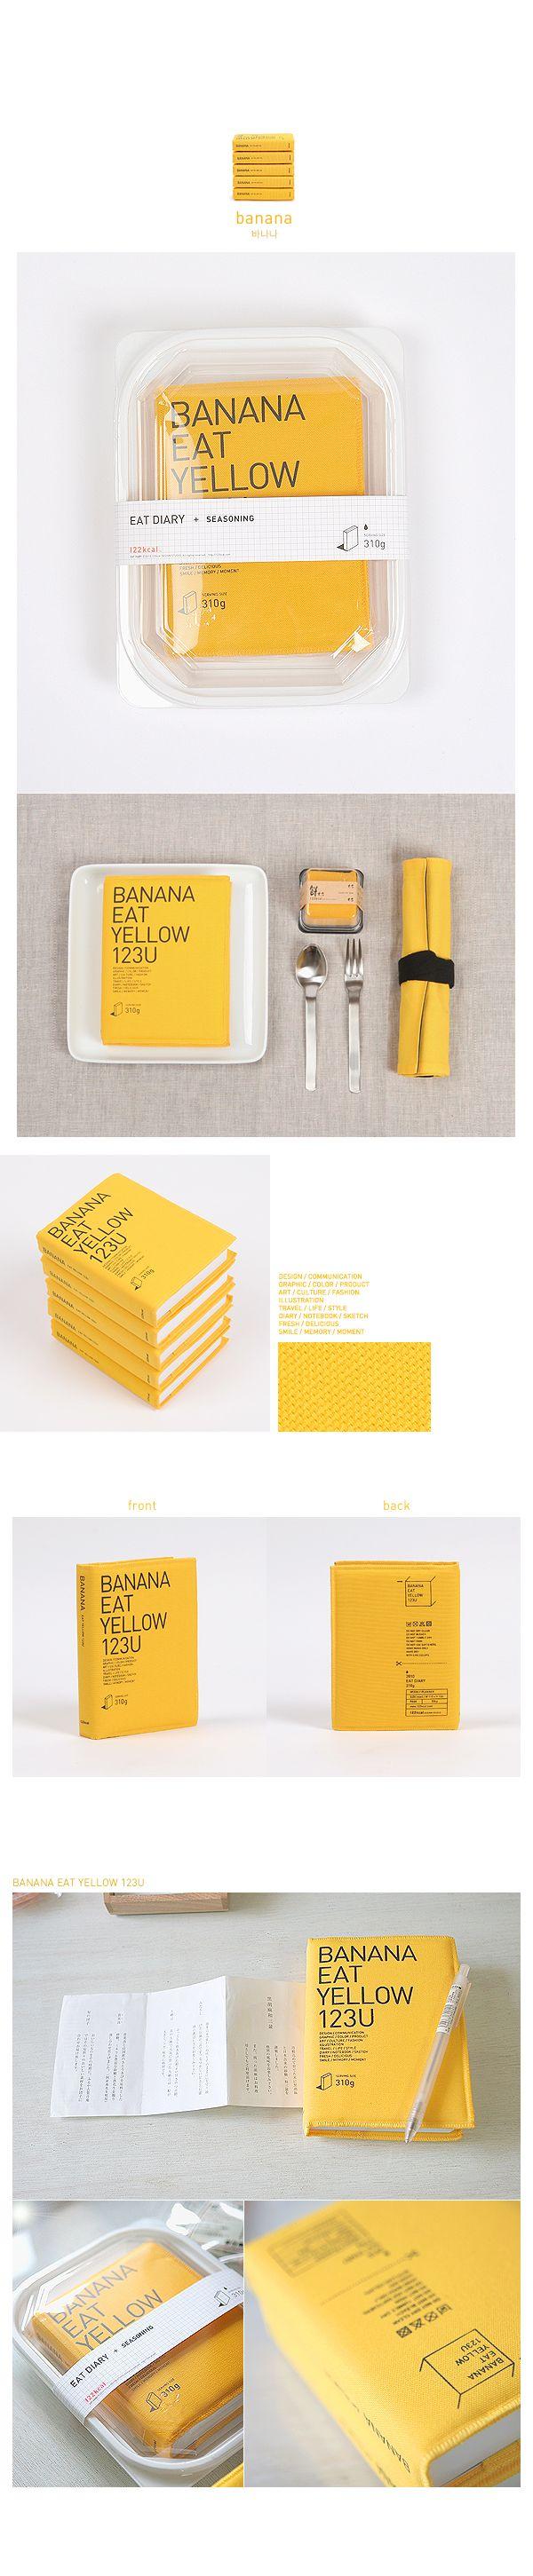 Agenda Eat | Alternative yellow book on plastic packaging | Editorial design